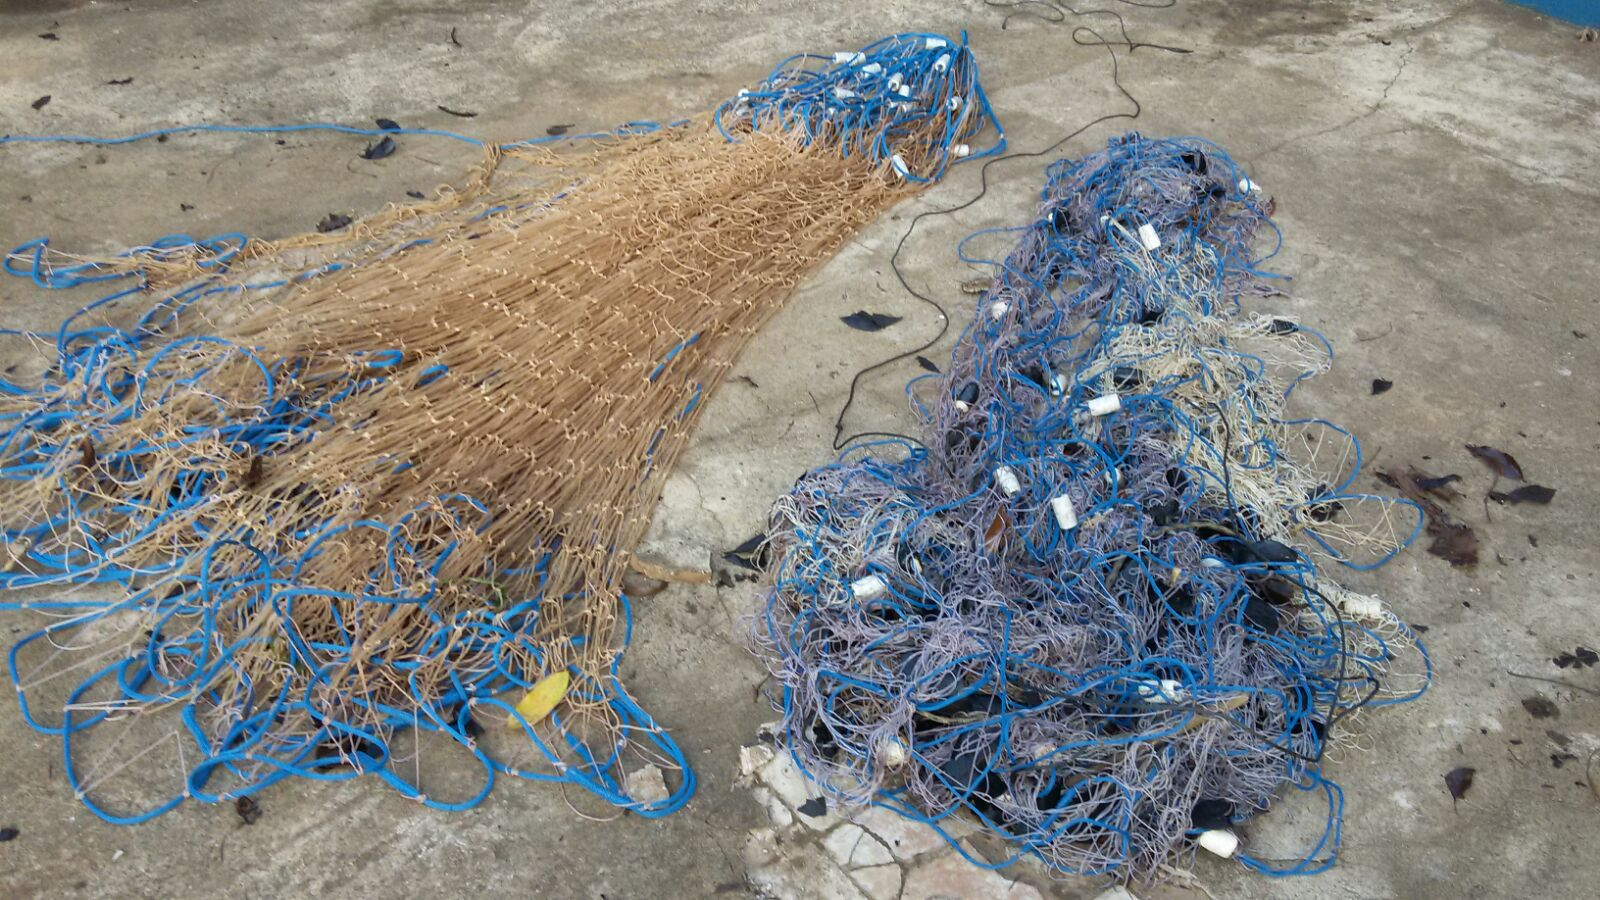 redes-de-pesca-apreendidas-PMA-Aquidauna-10-nov-2015